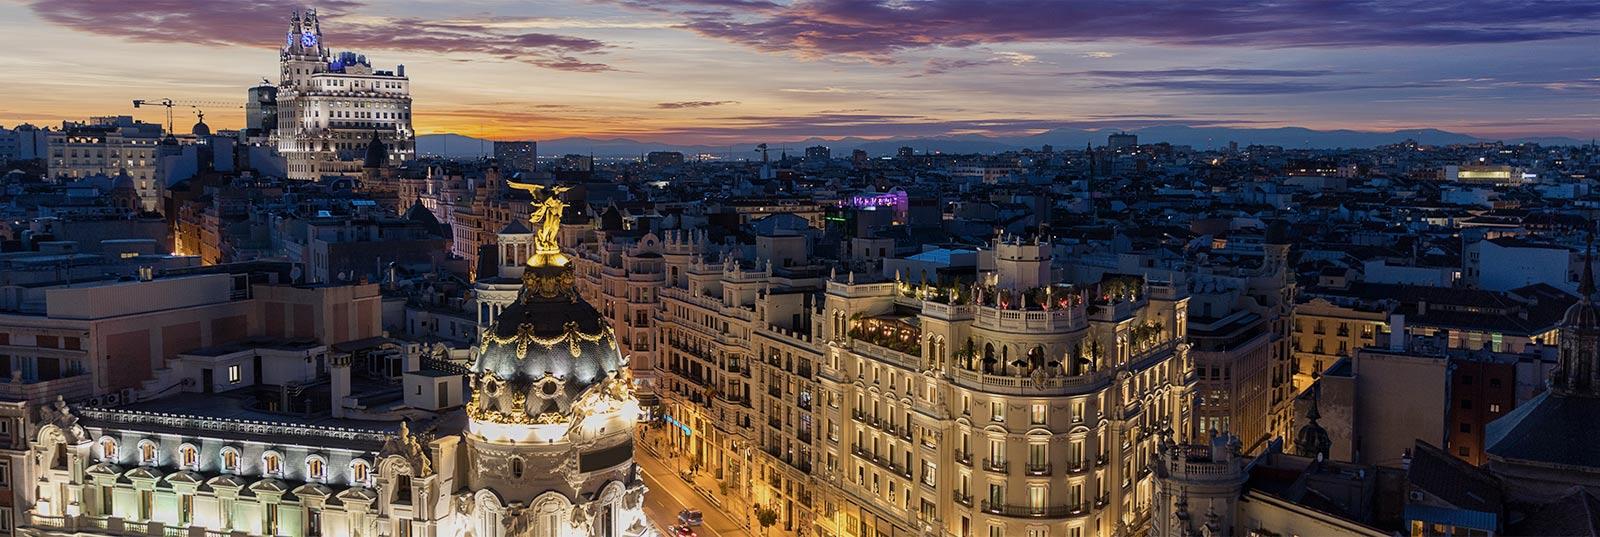 Madrid - Guide touristique de Madrid - Visitons Madrid